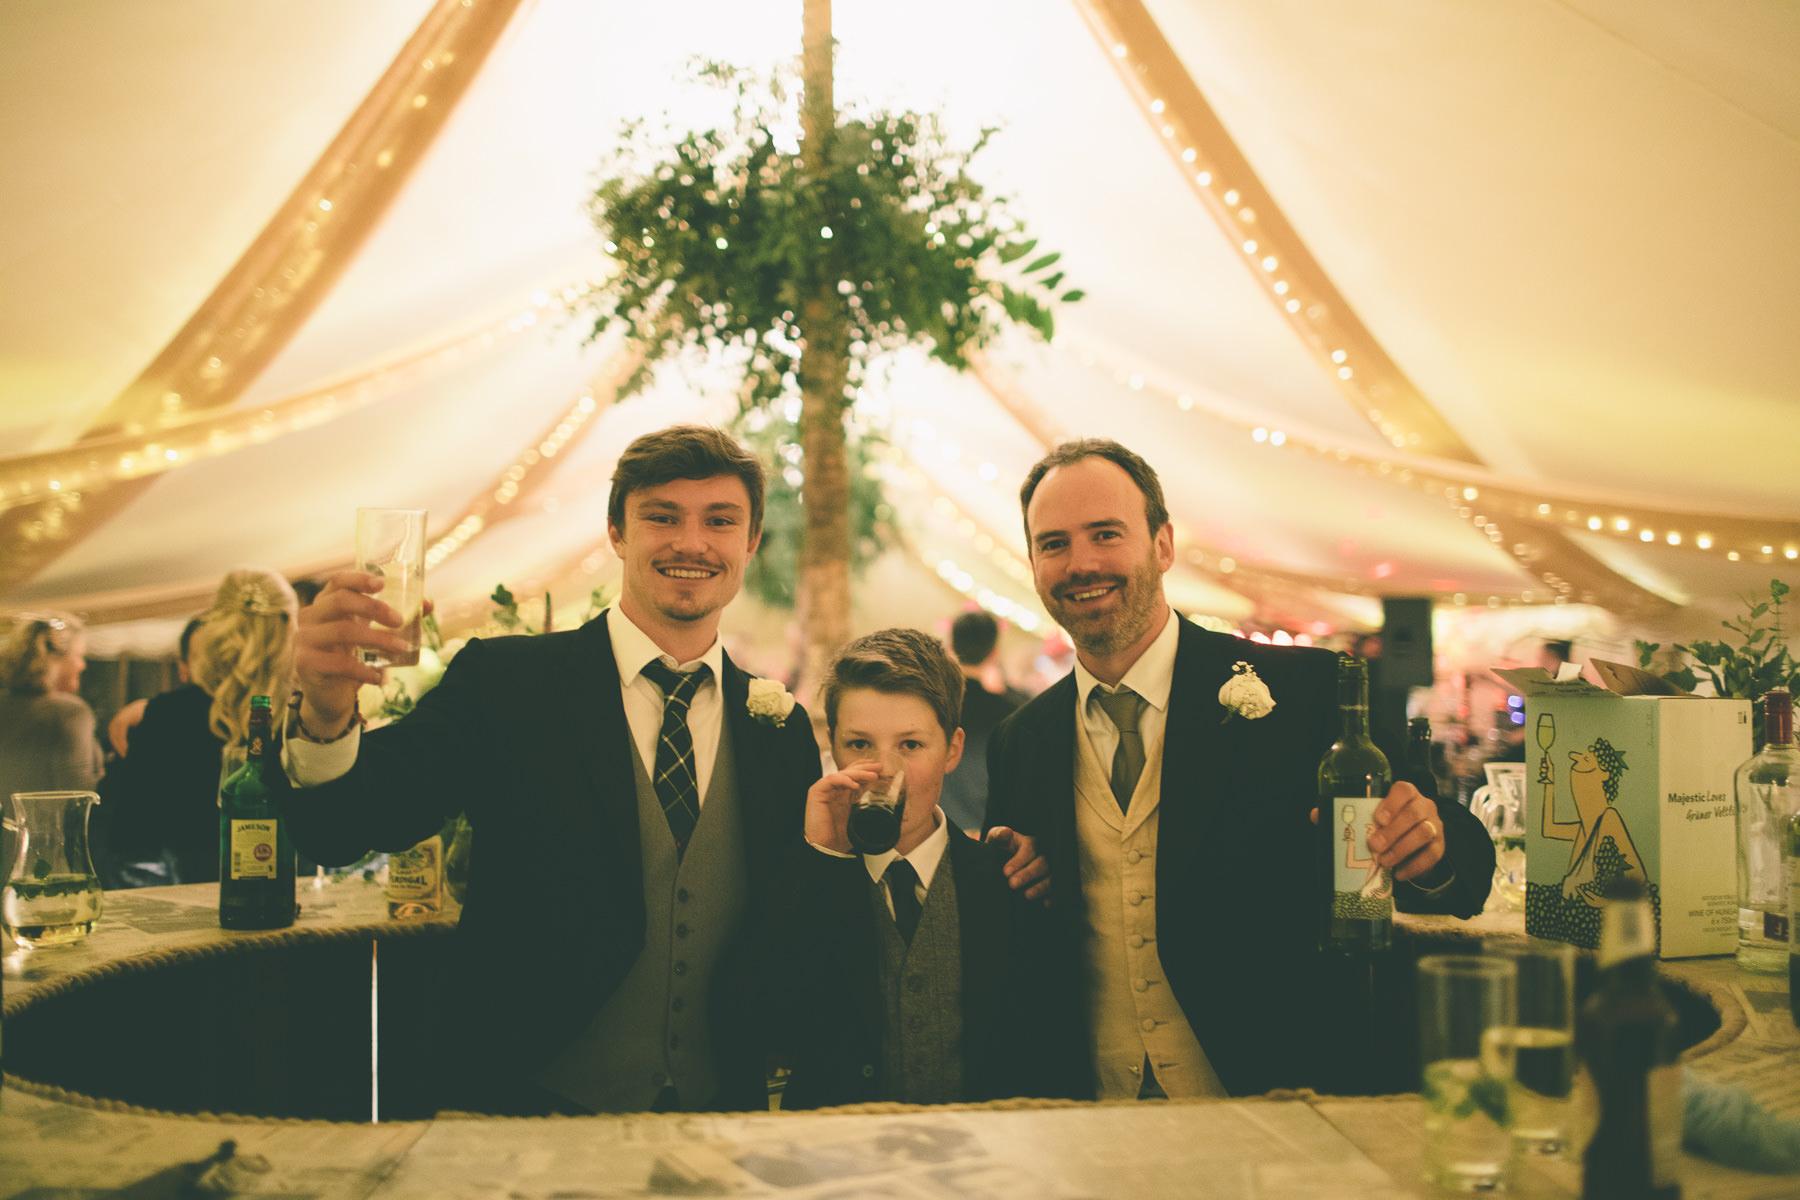 Pamber-Place-wedding-photography-basingstoke-hampshire-259